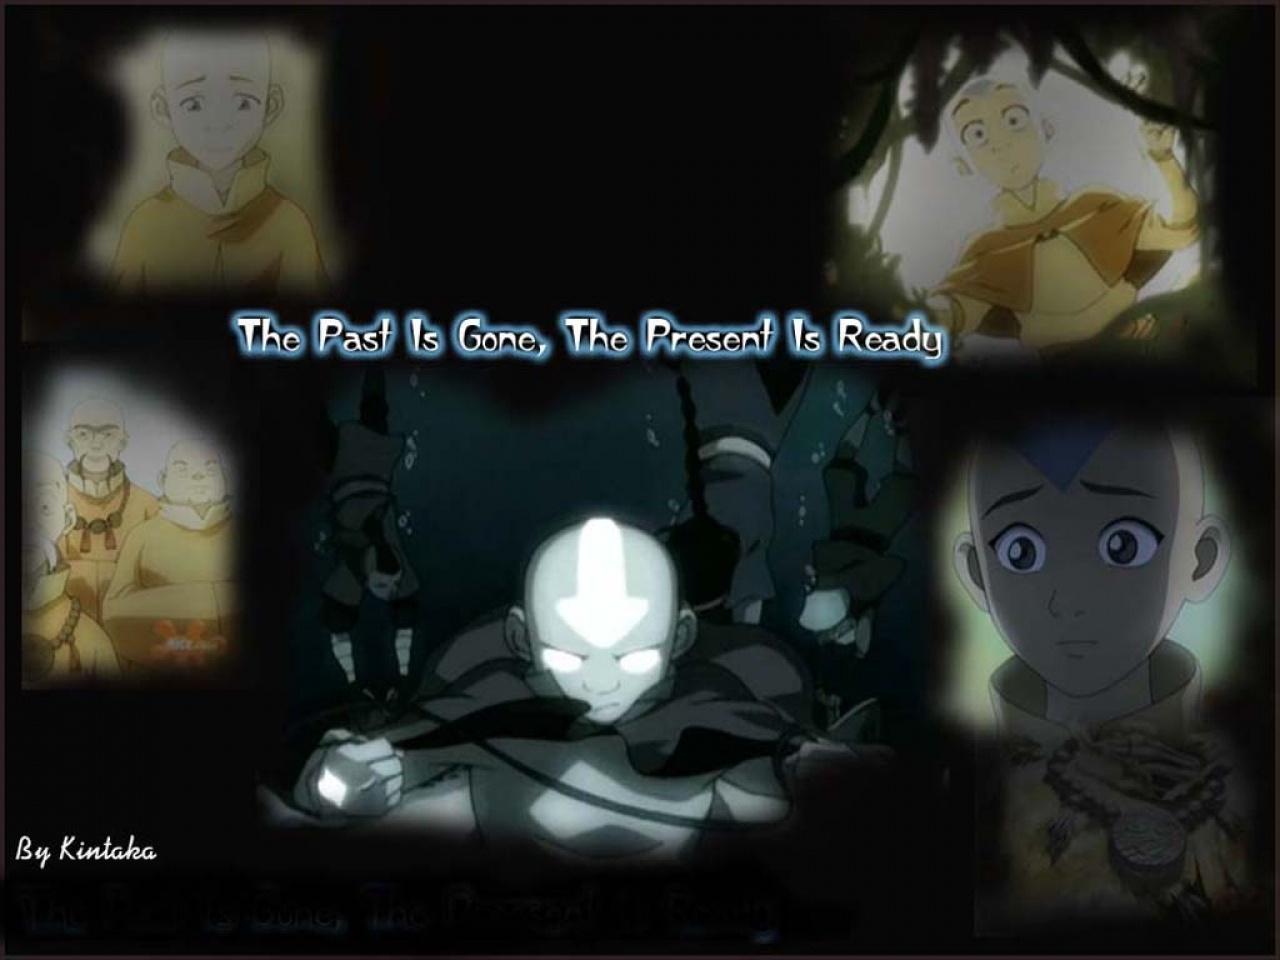 Aang Avatar The Last Airbender Wallpaper 25661171 1280x960